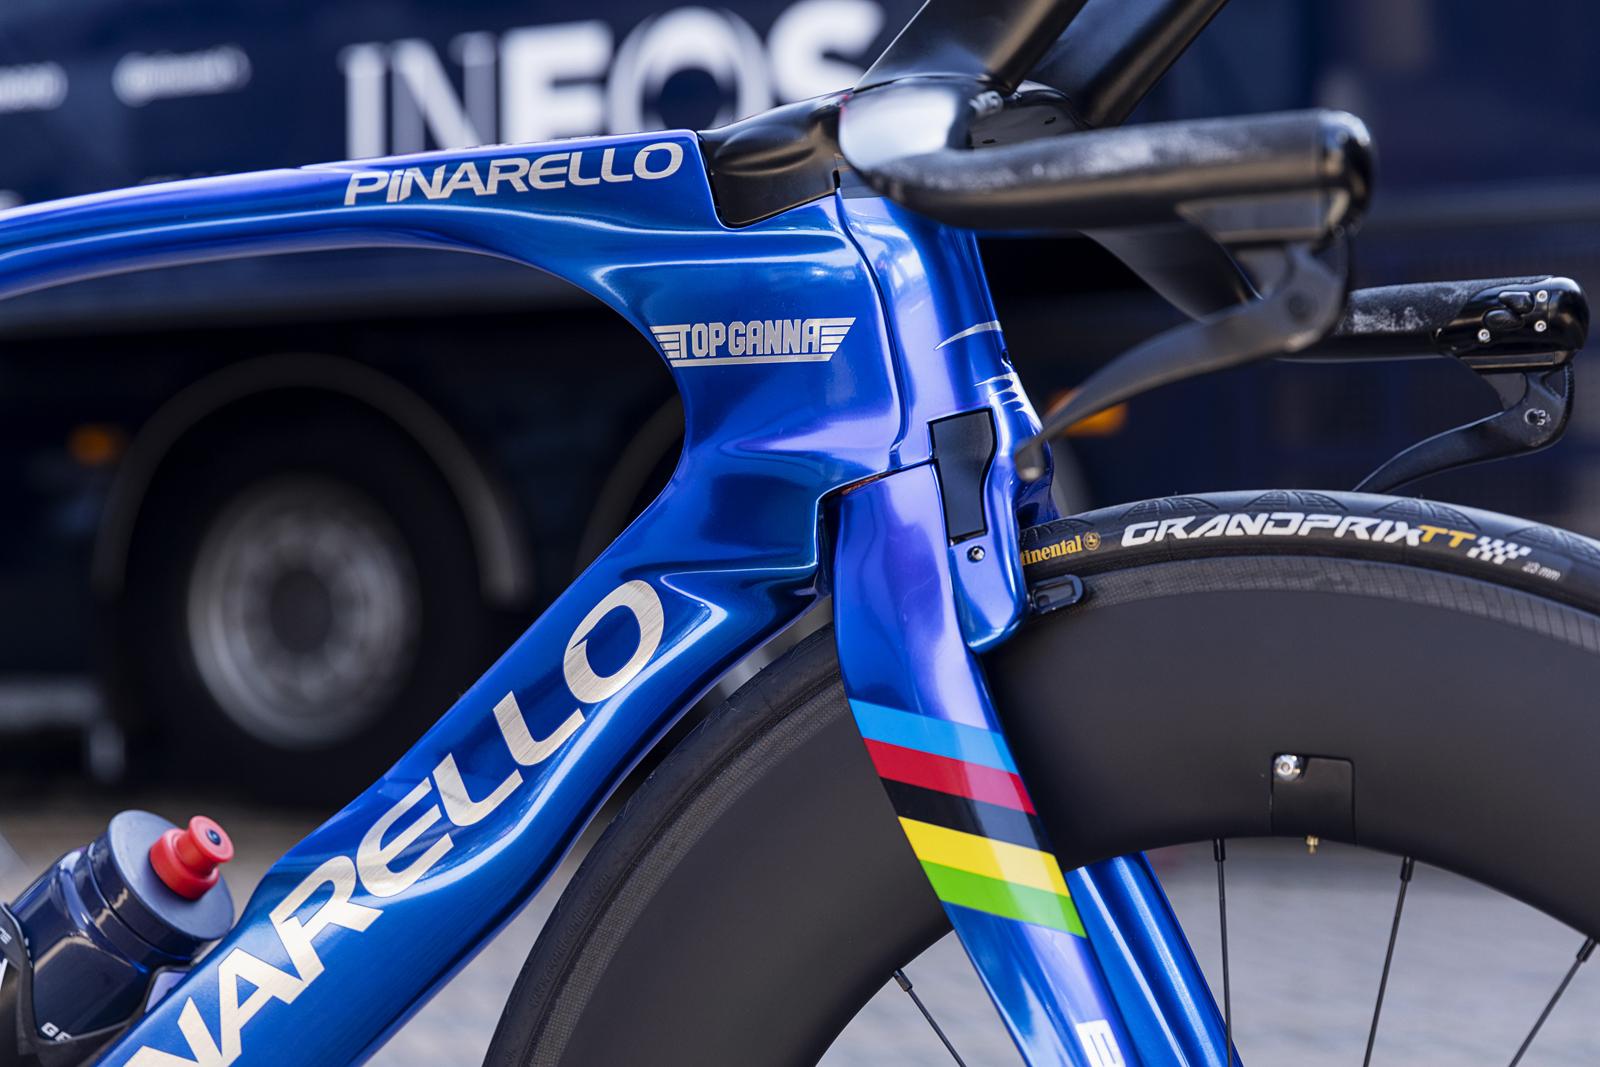 Filippo Ganna's new Pinarello Bolide TT for the Giro d'Italia